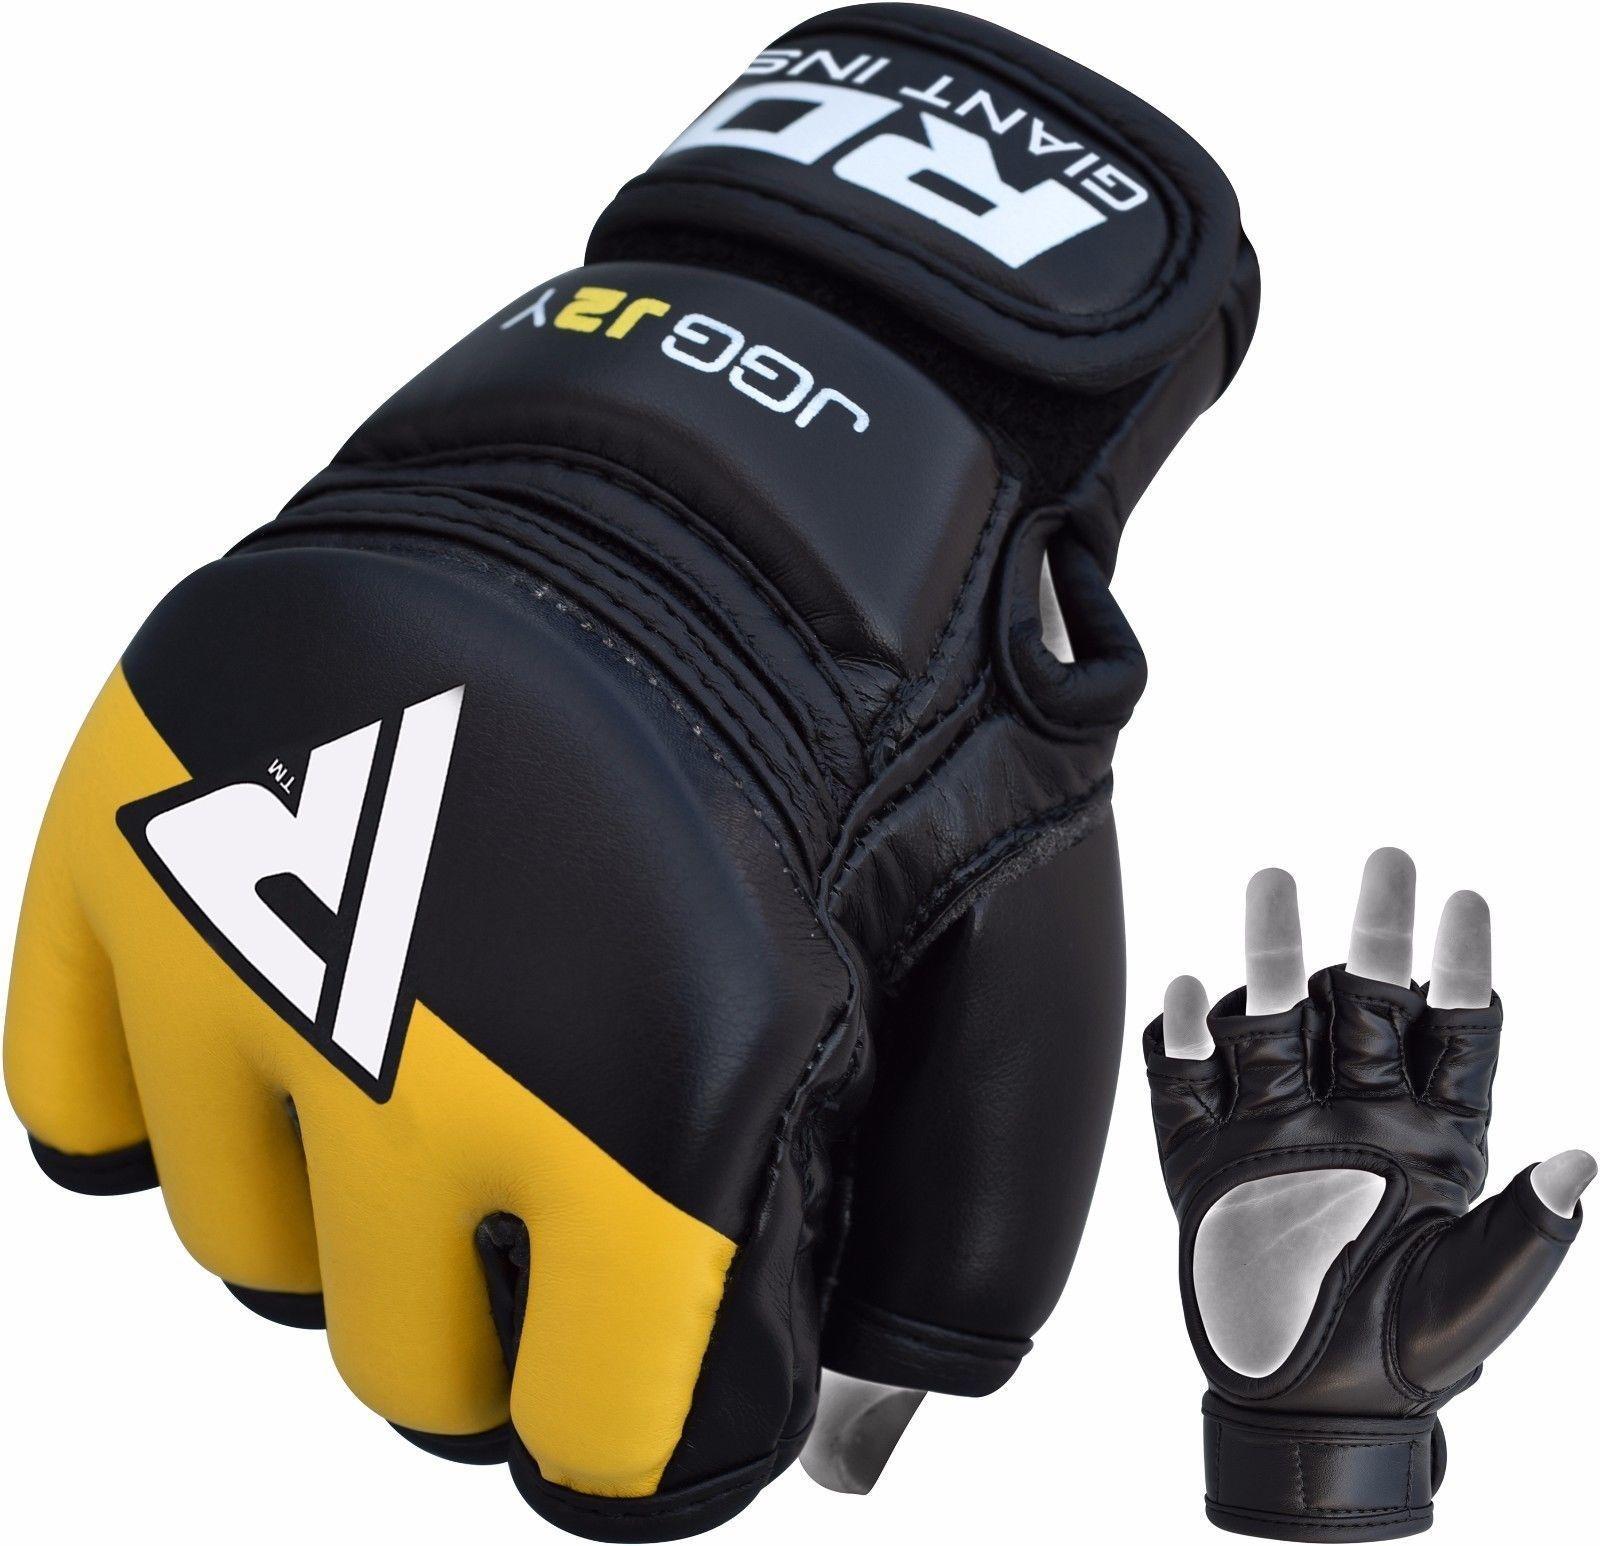 RDX Grappling Gloves Kids - Zwart met groen-538690